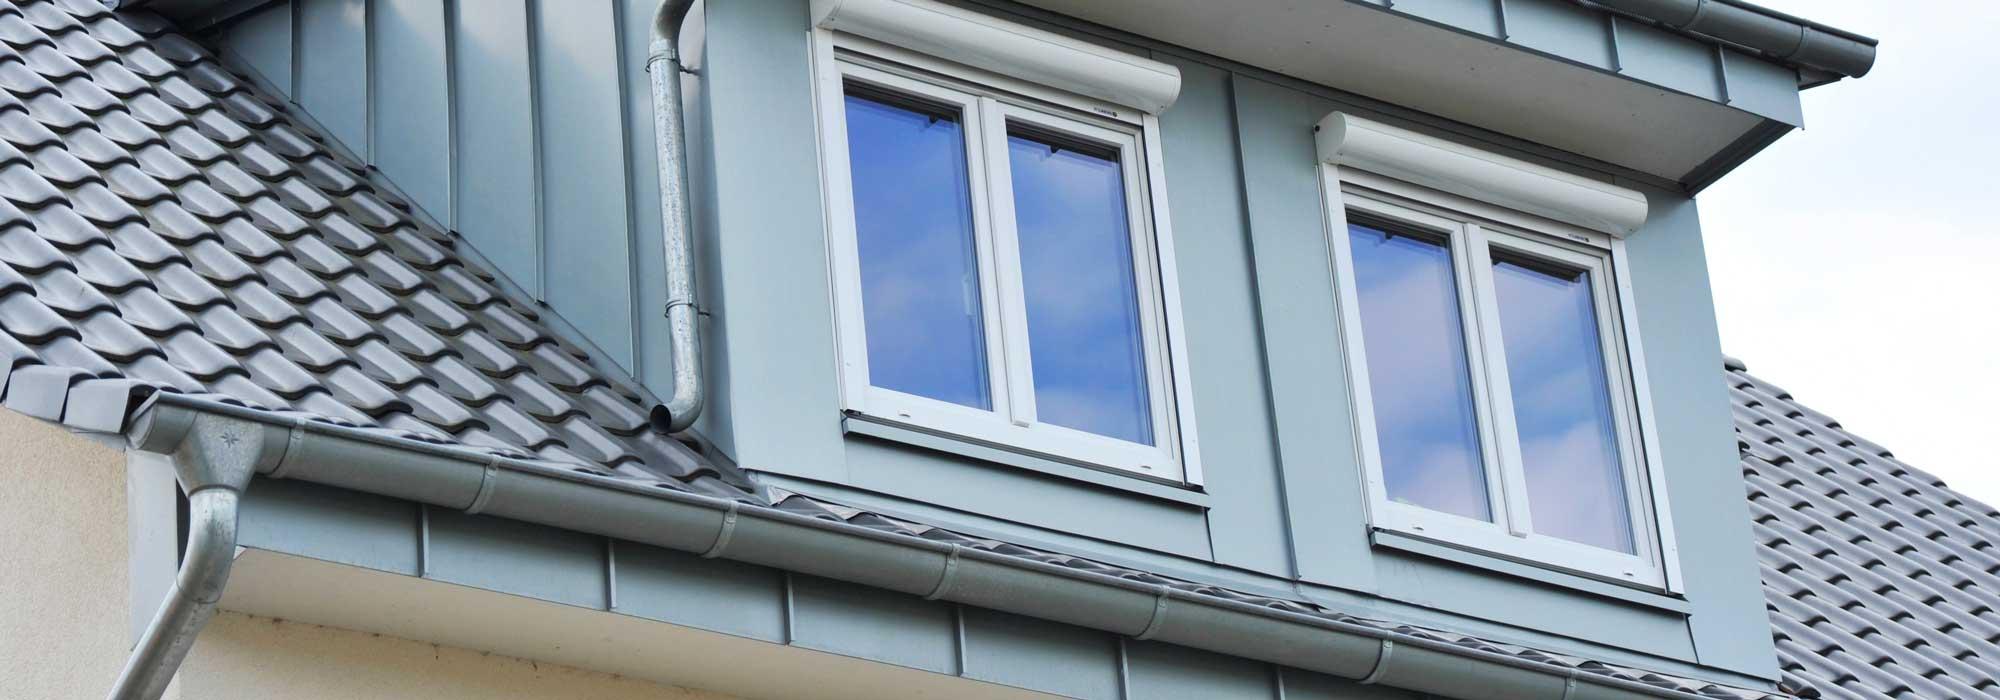 dormer-loft-conversion-cost